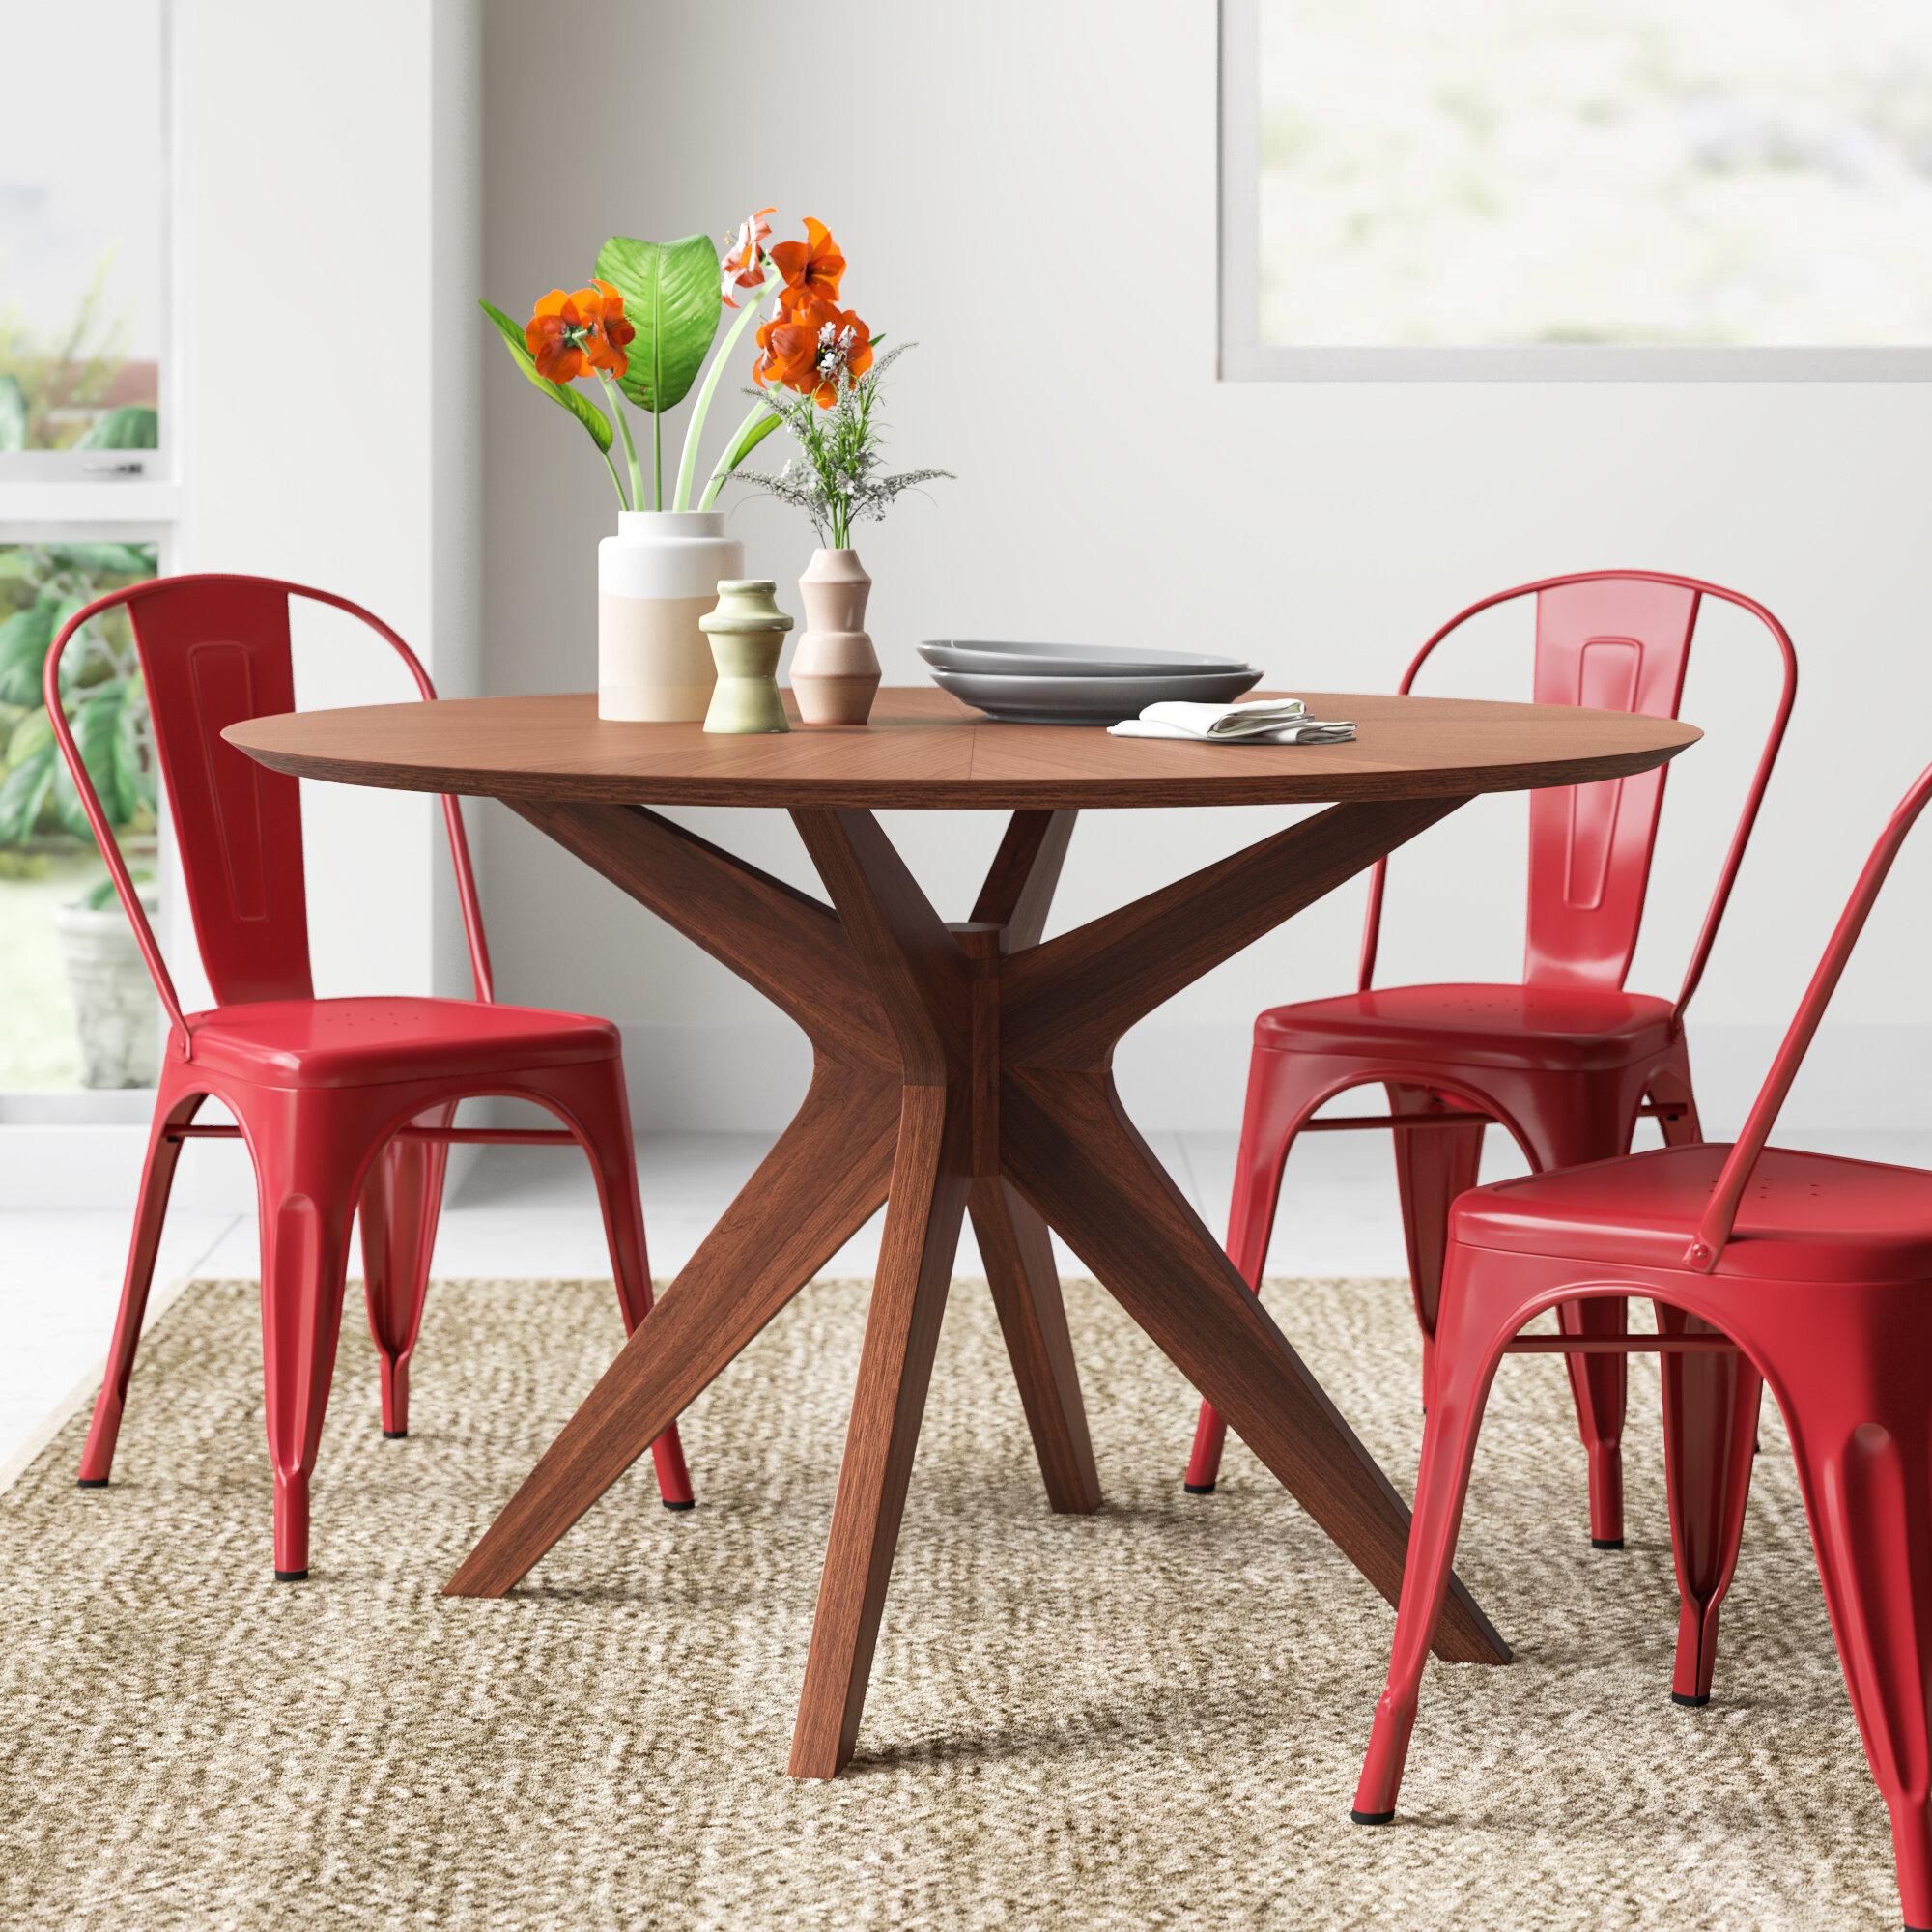 Phenomenal Kori Dining Table Alphanode Cool Chair Designs And Ideas Alphanodeonline